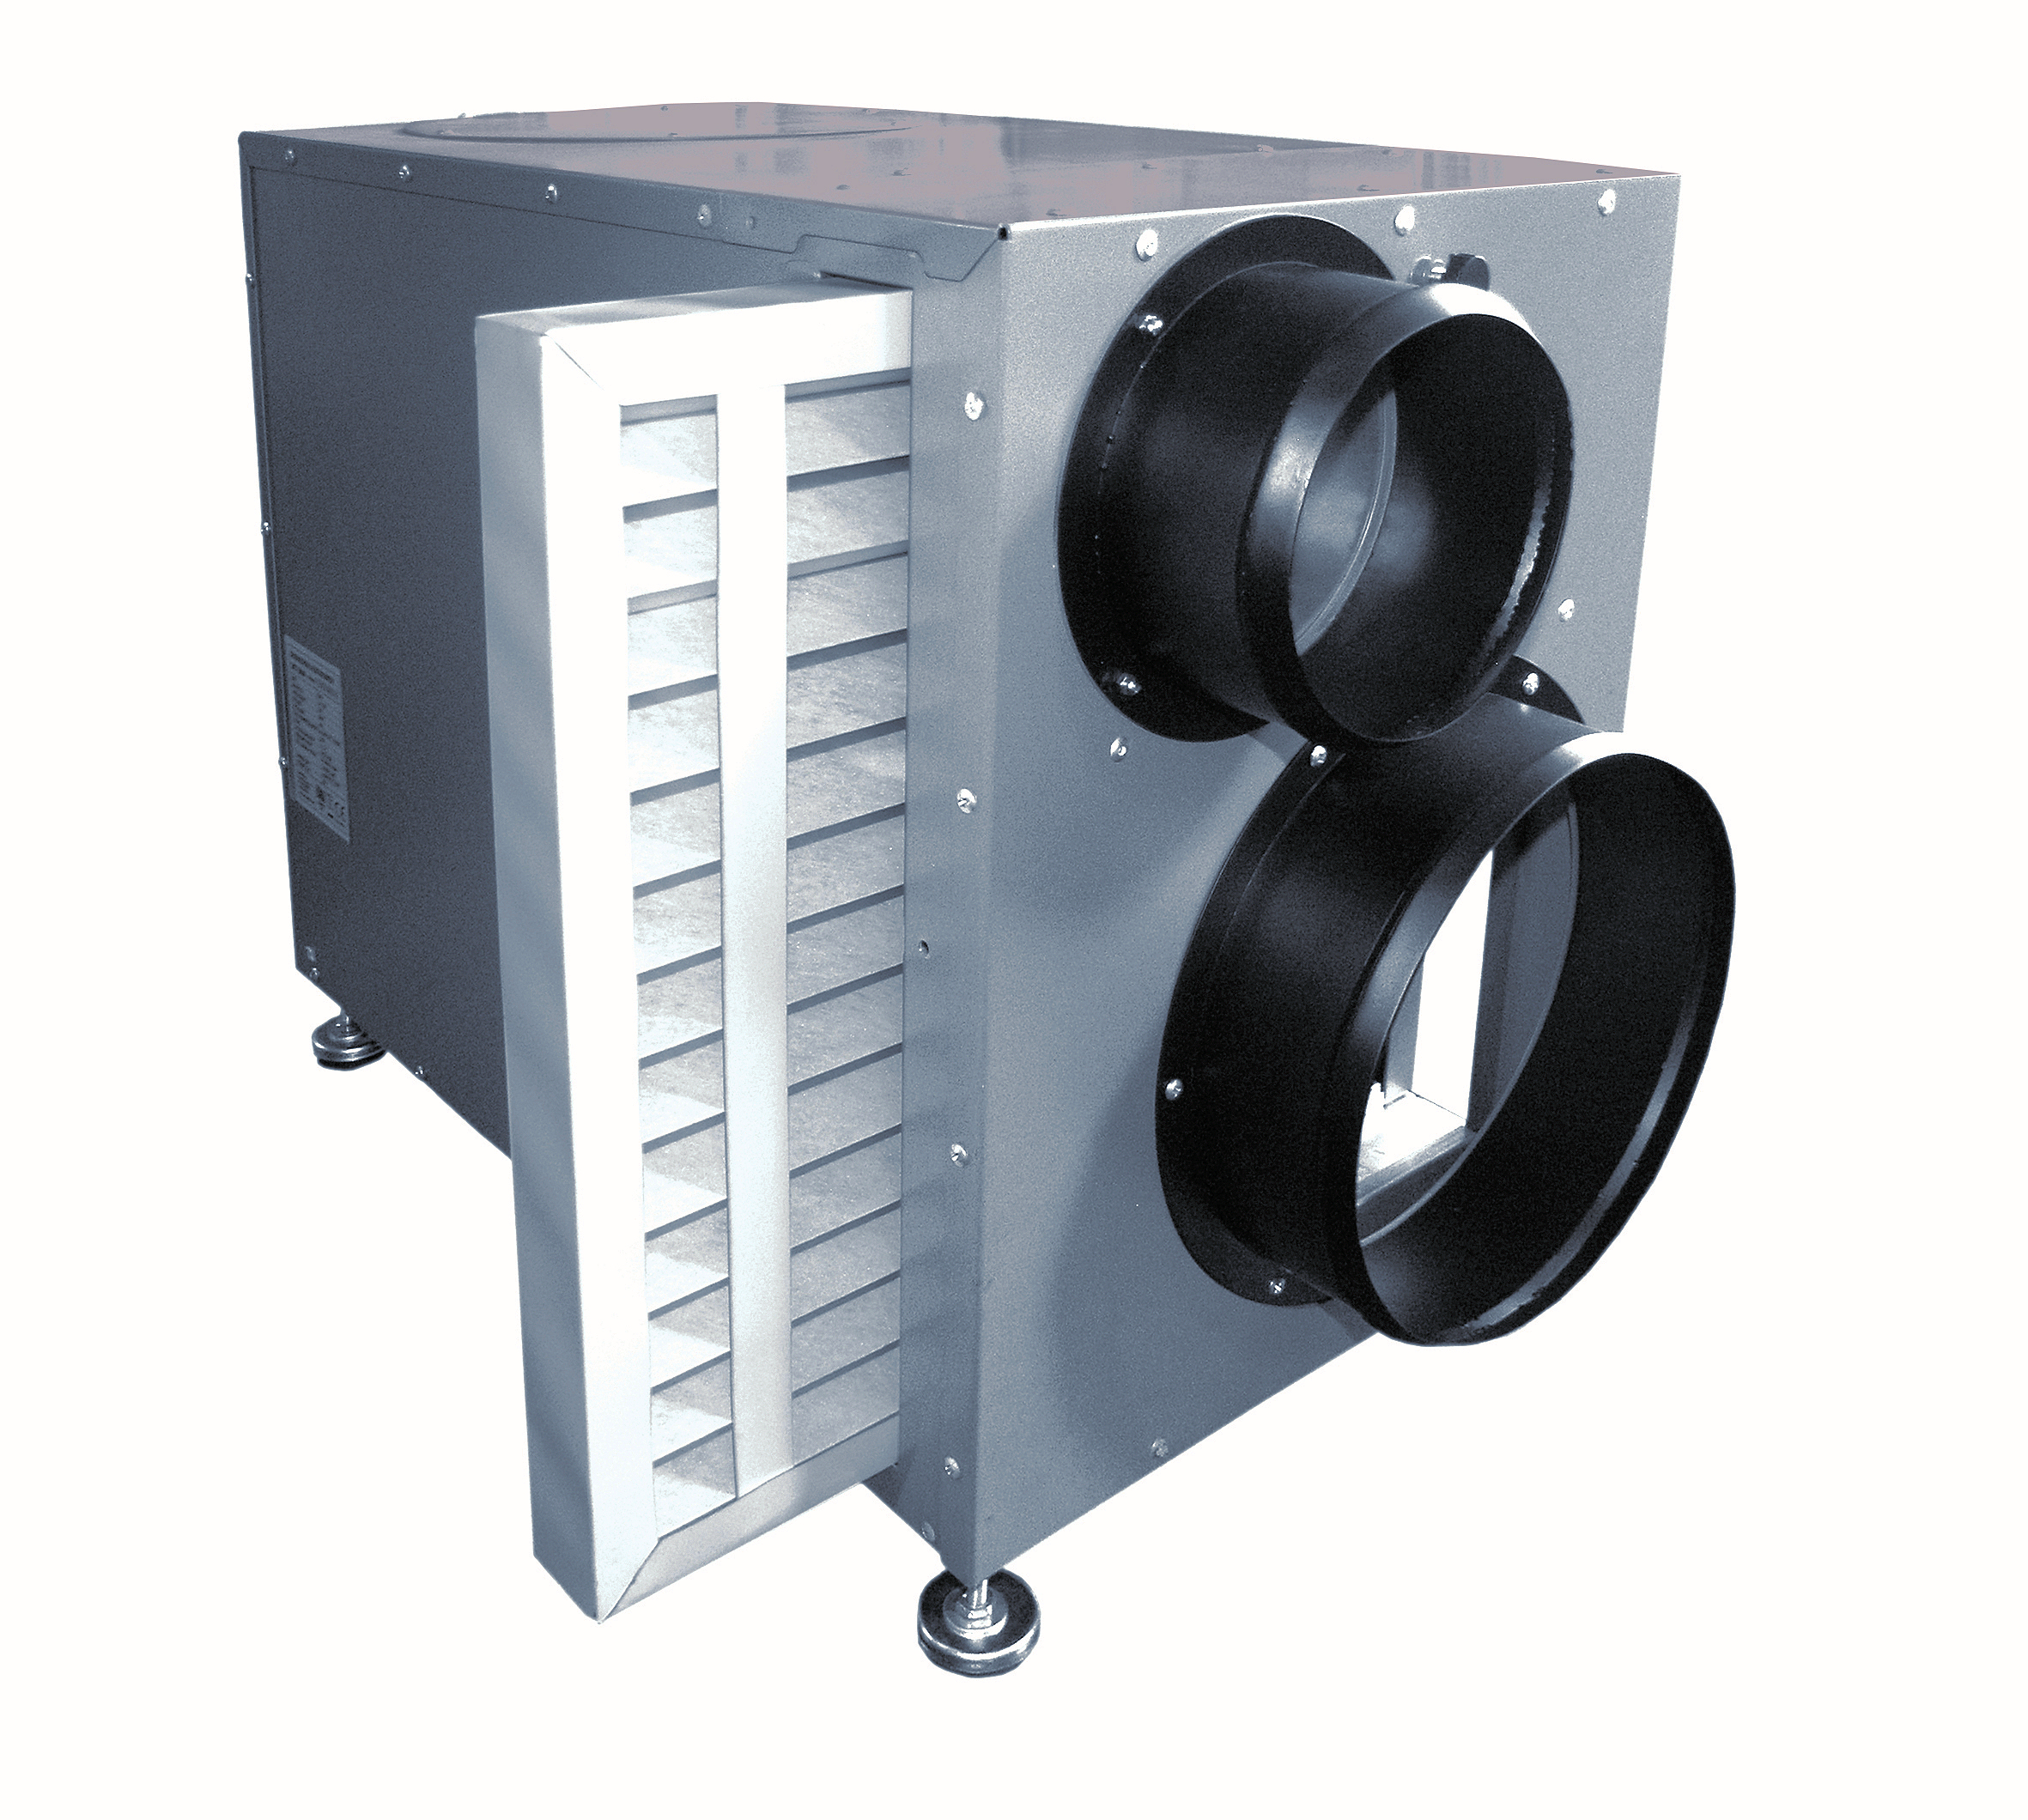 dehumidifier hepa filter dehumidifiers by Ecor Pro